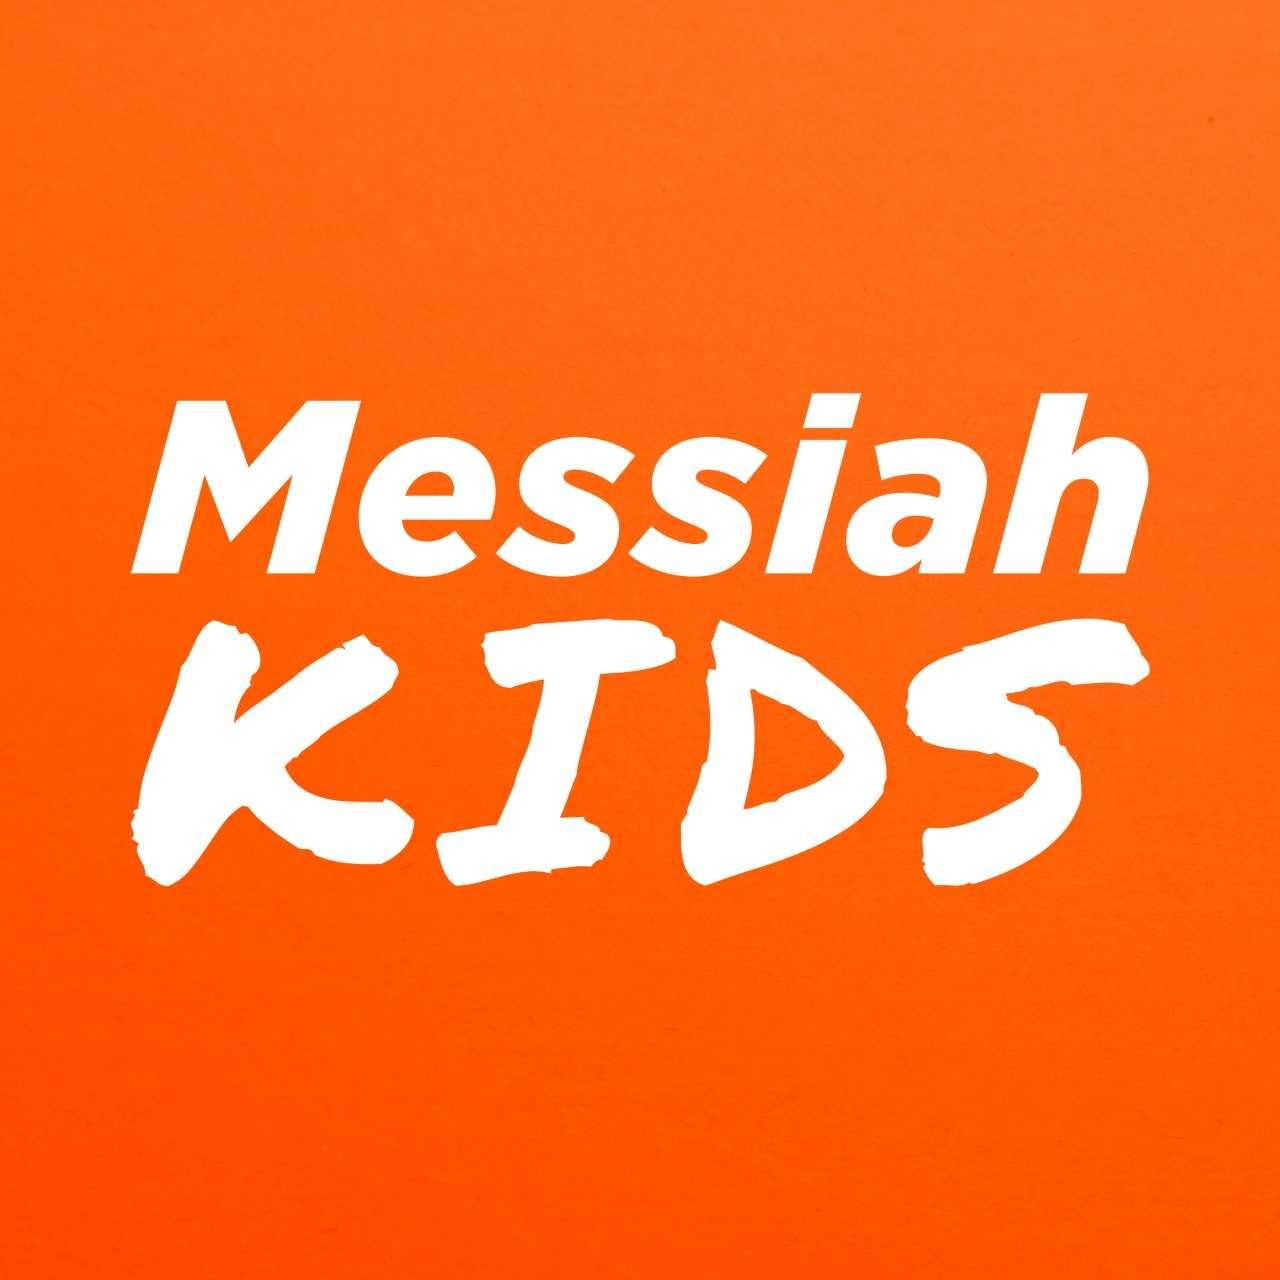 Messiahkids